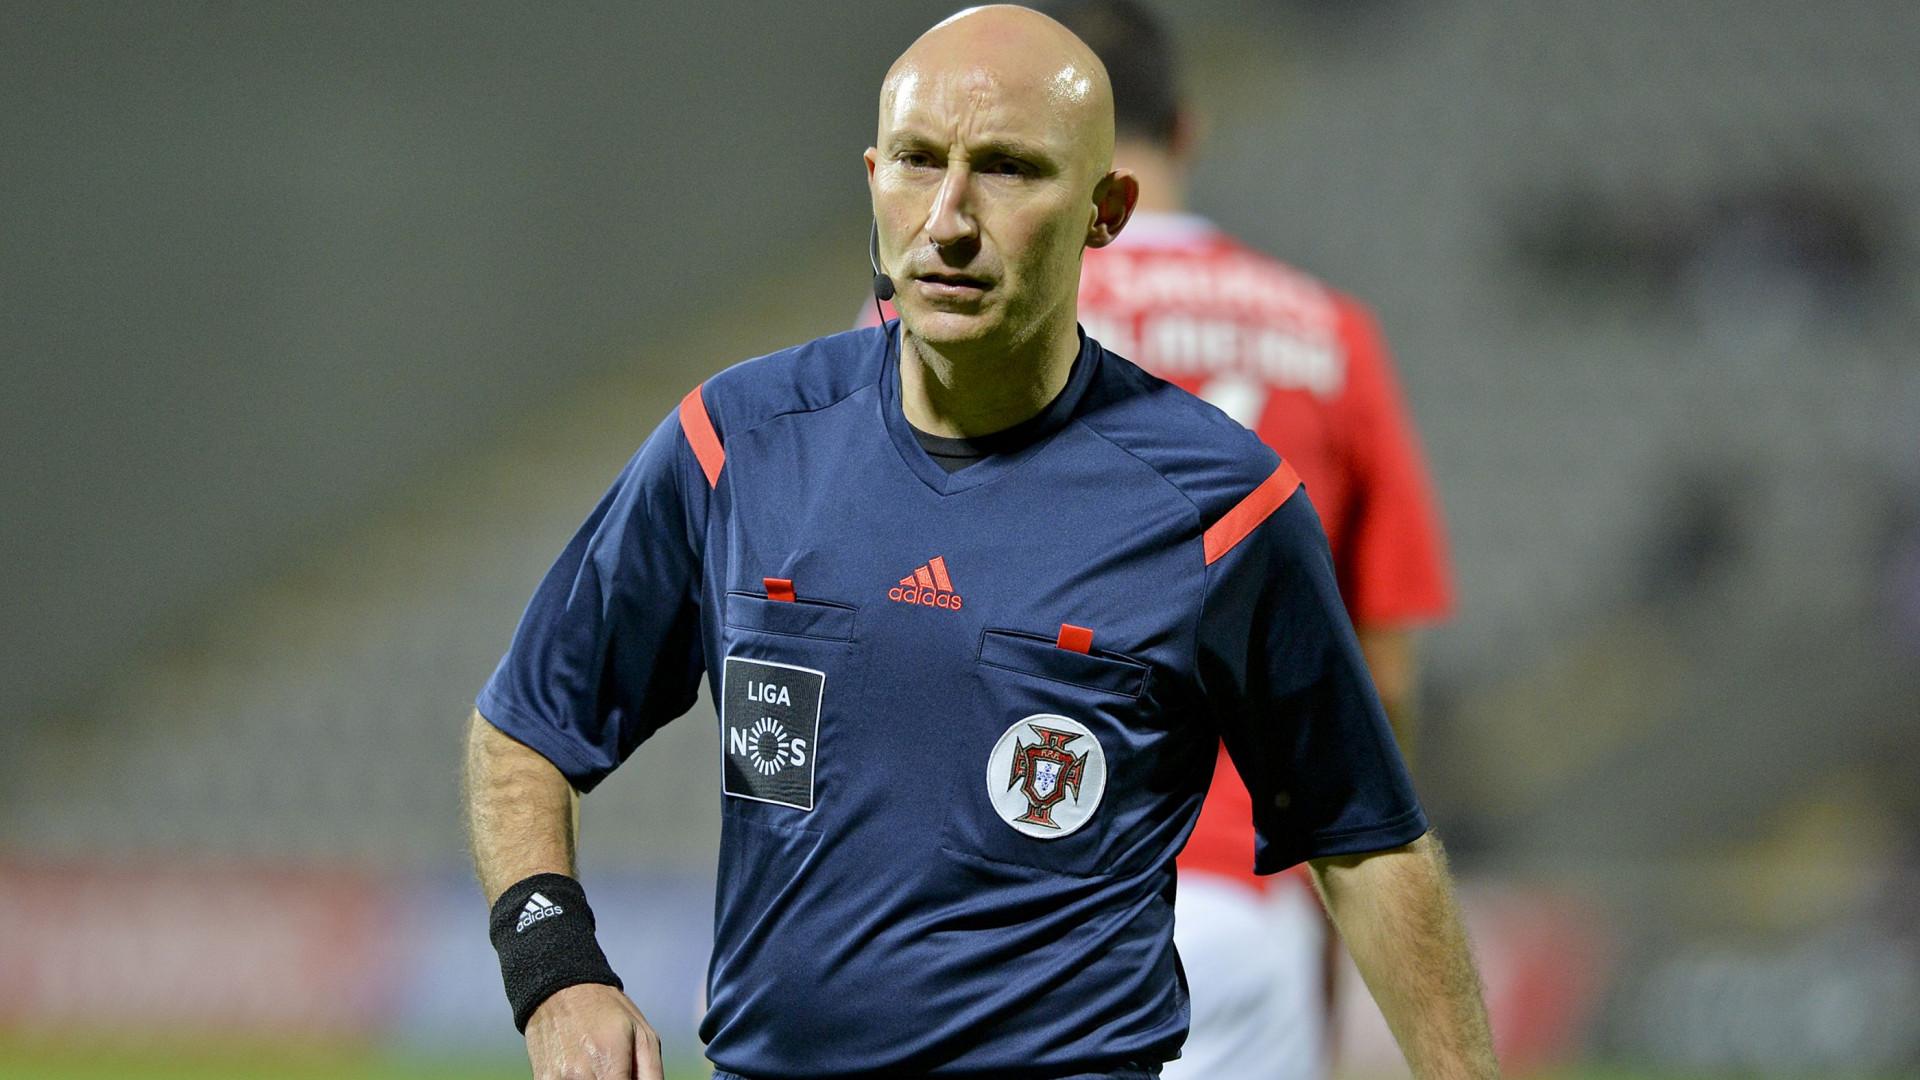 Sporting de Braga contrata ex-árbitro Cosme Machado